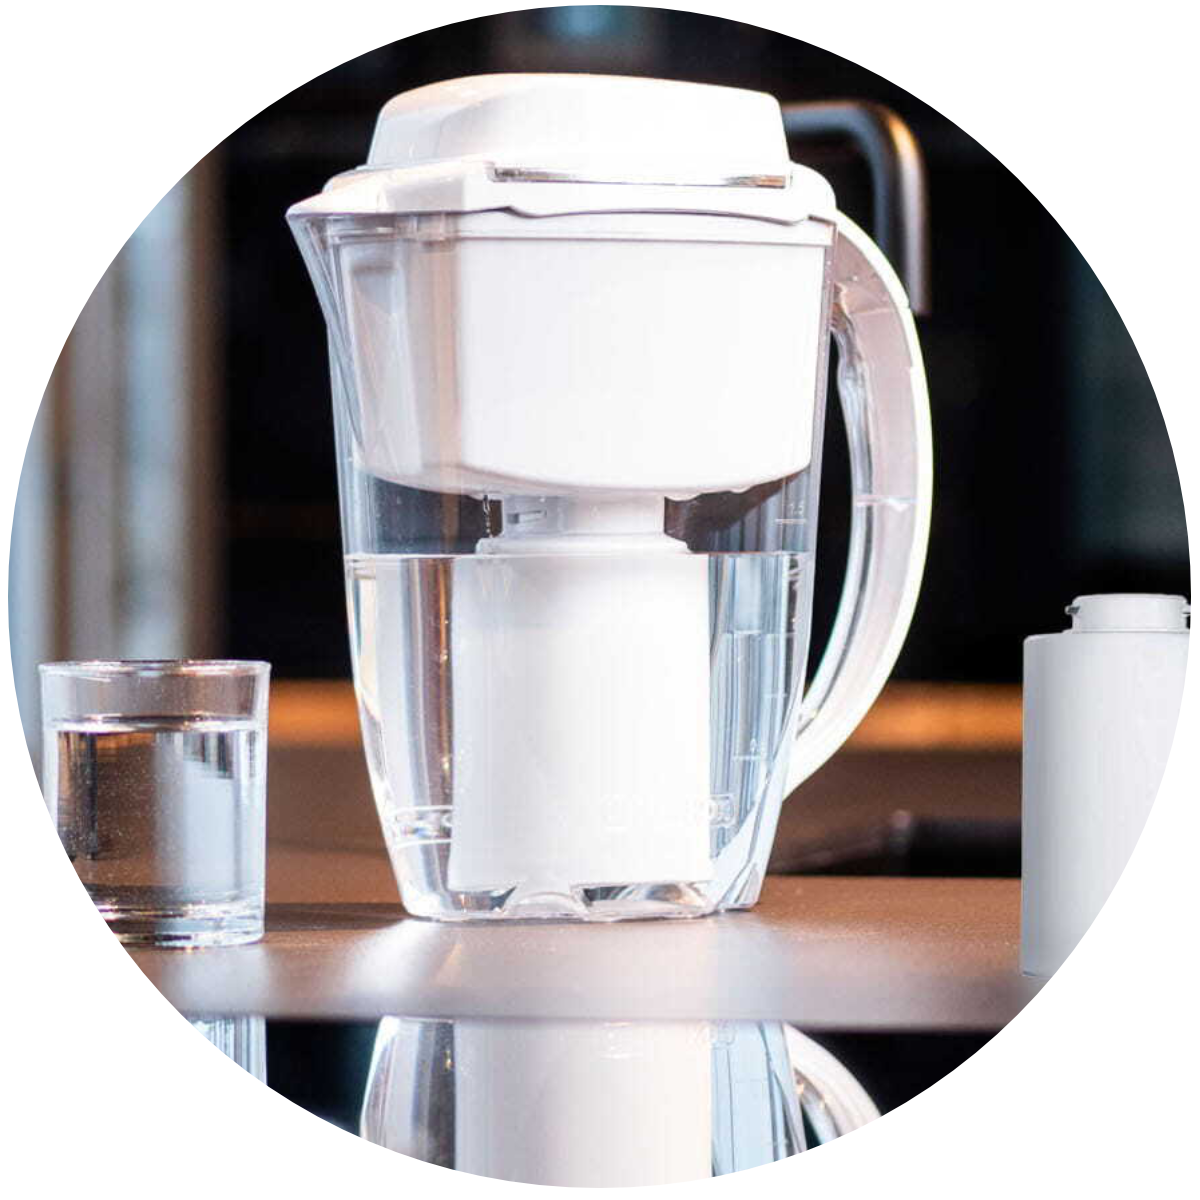 Aquaphor J.Shmidt 500 (biały) dzbanek filtrujący - panel